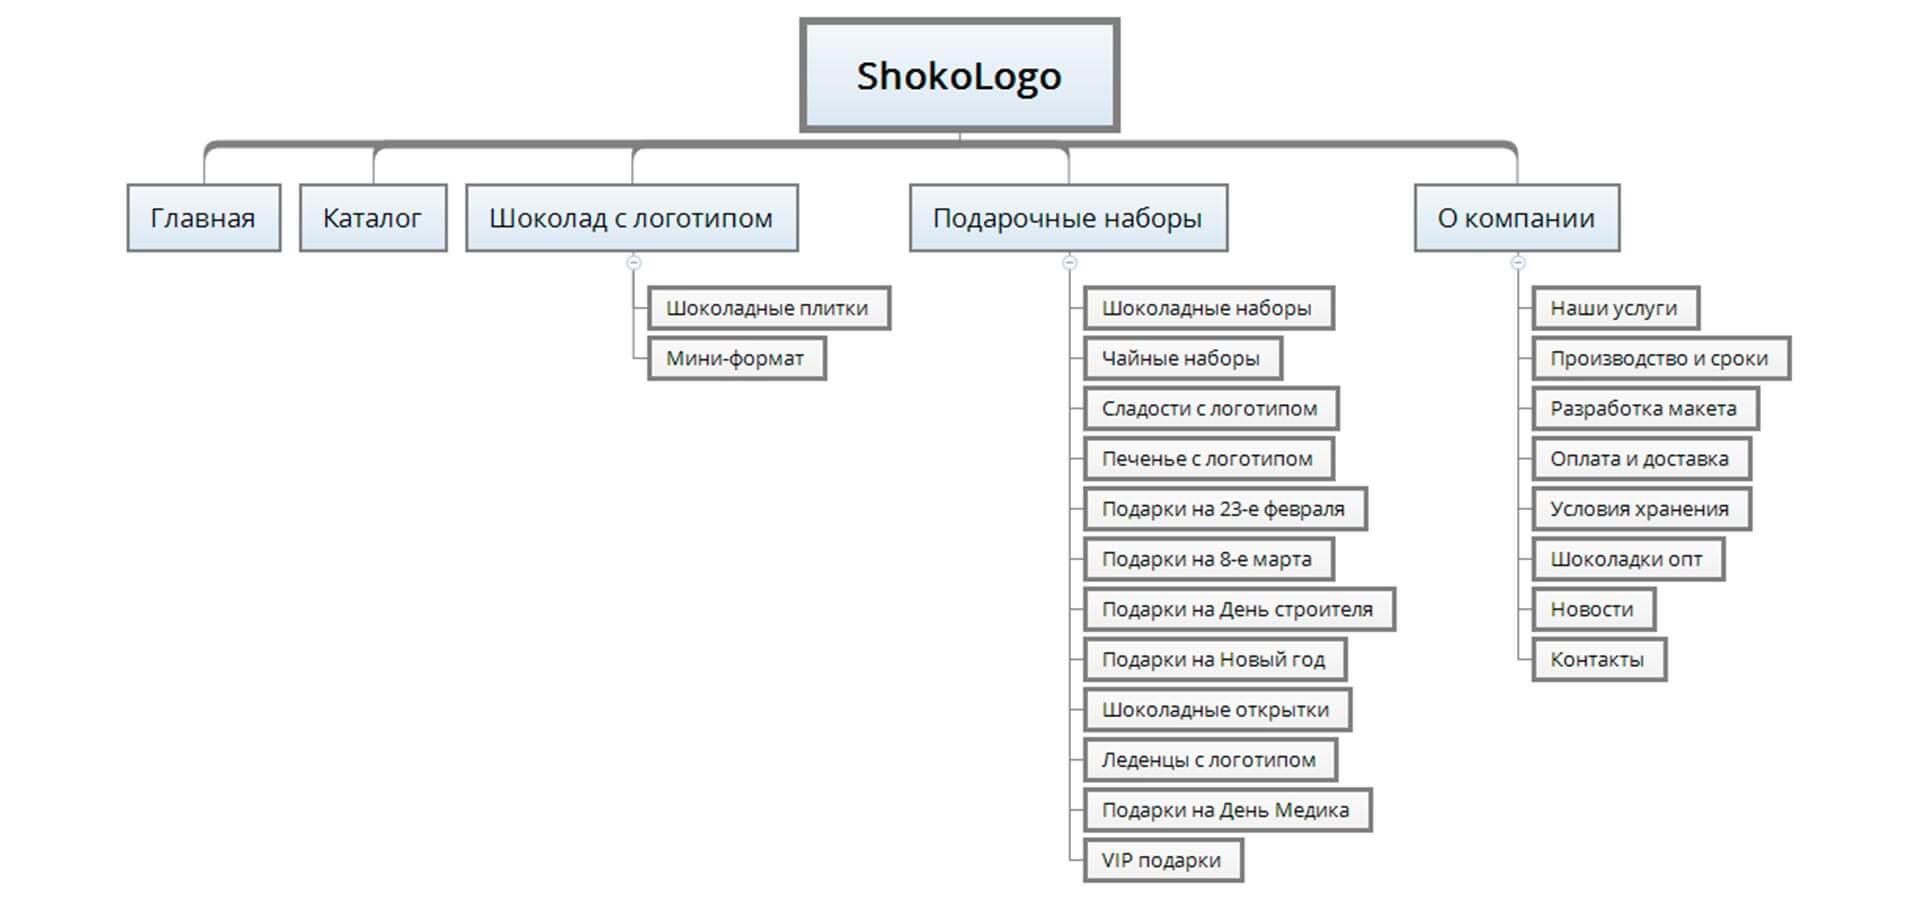 seo-структура сайта по шоколаду